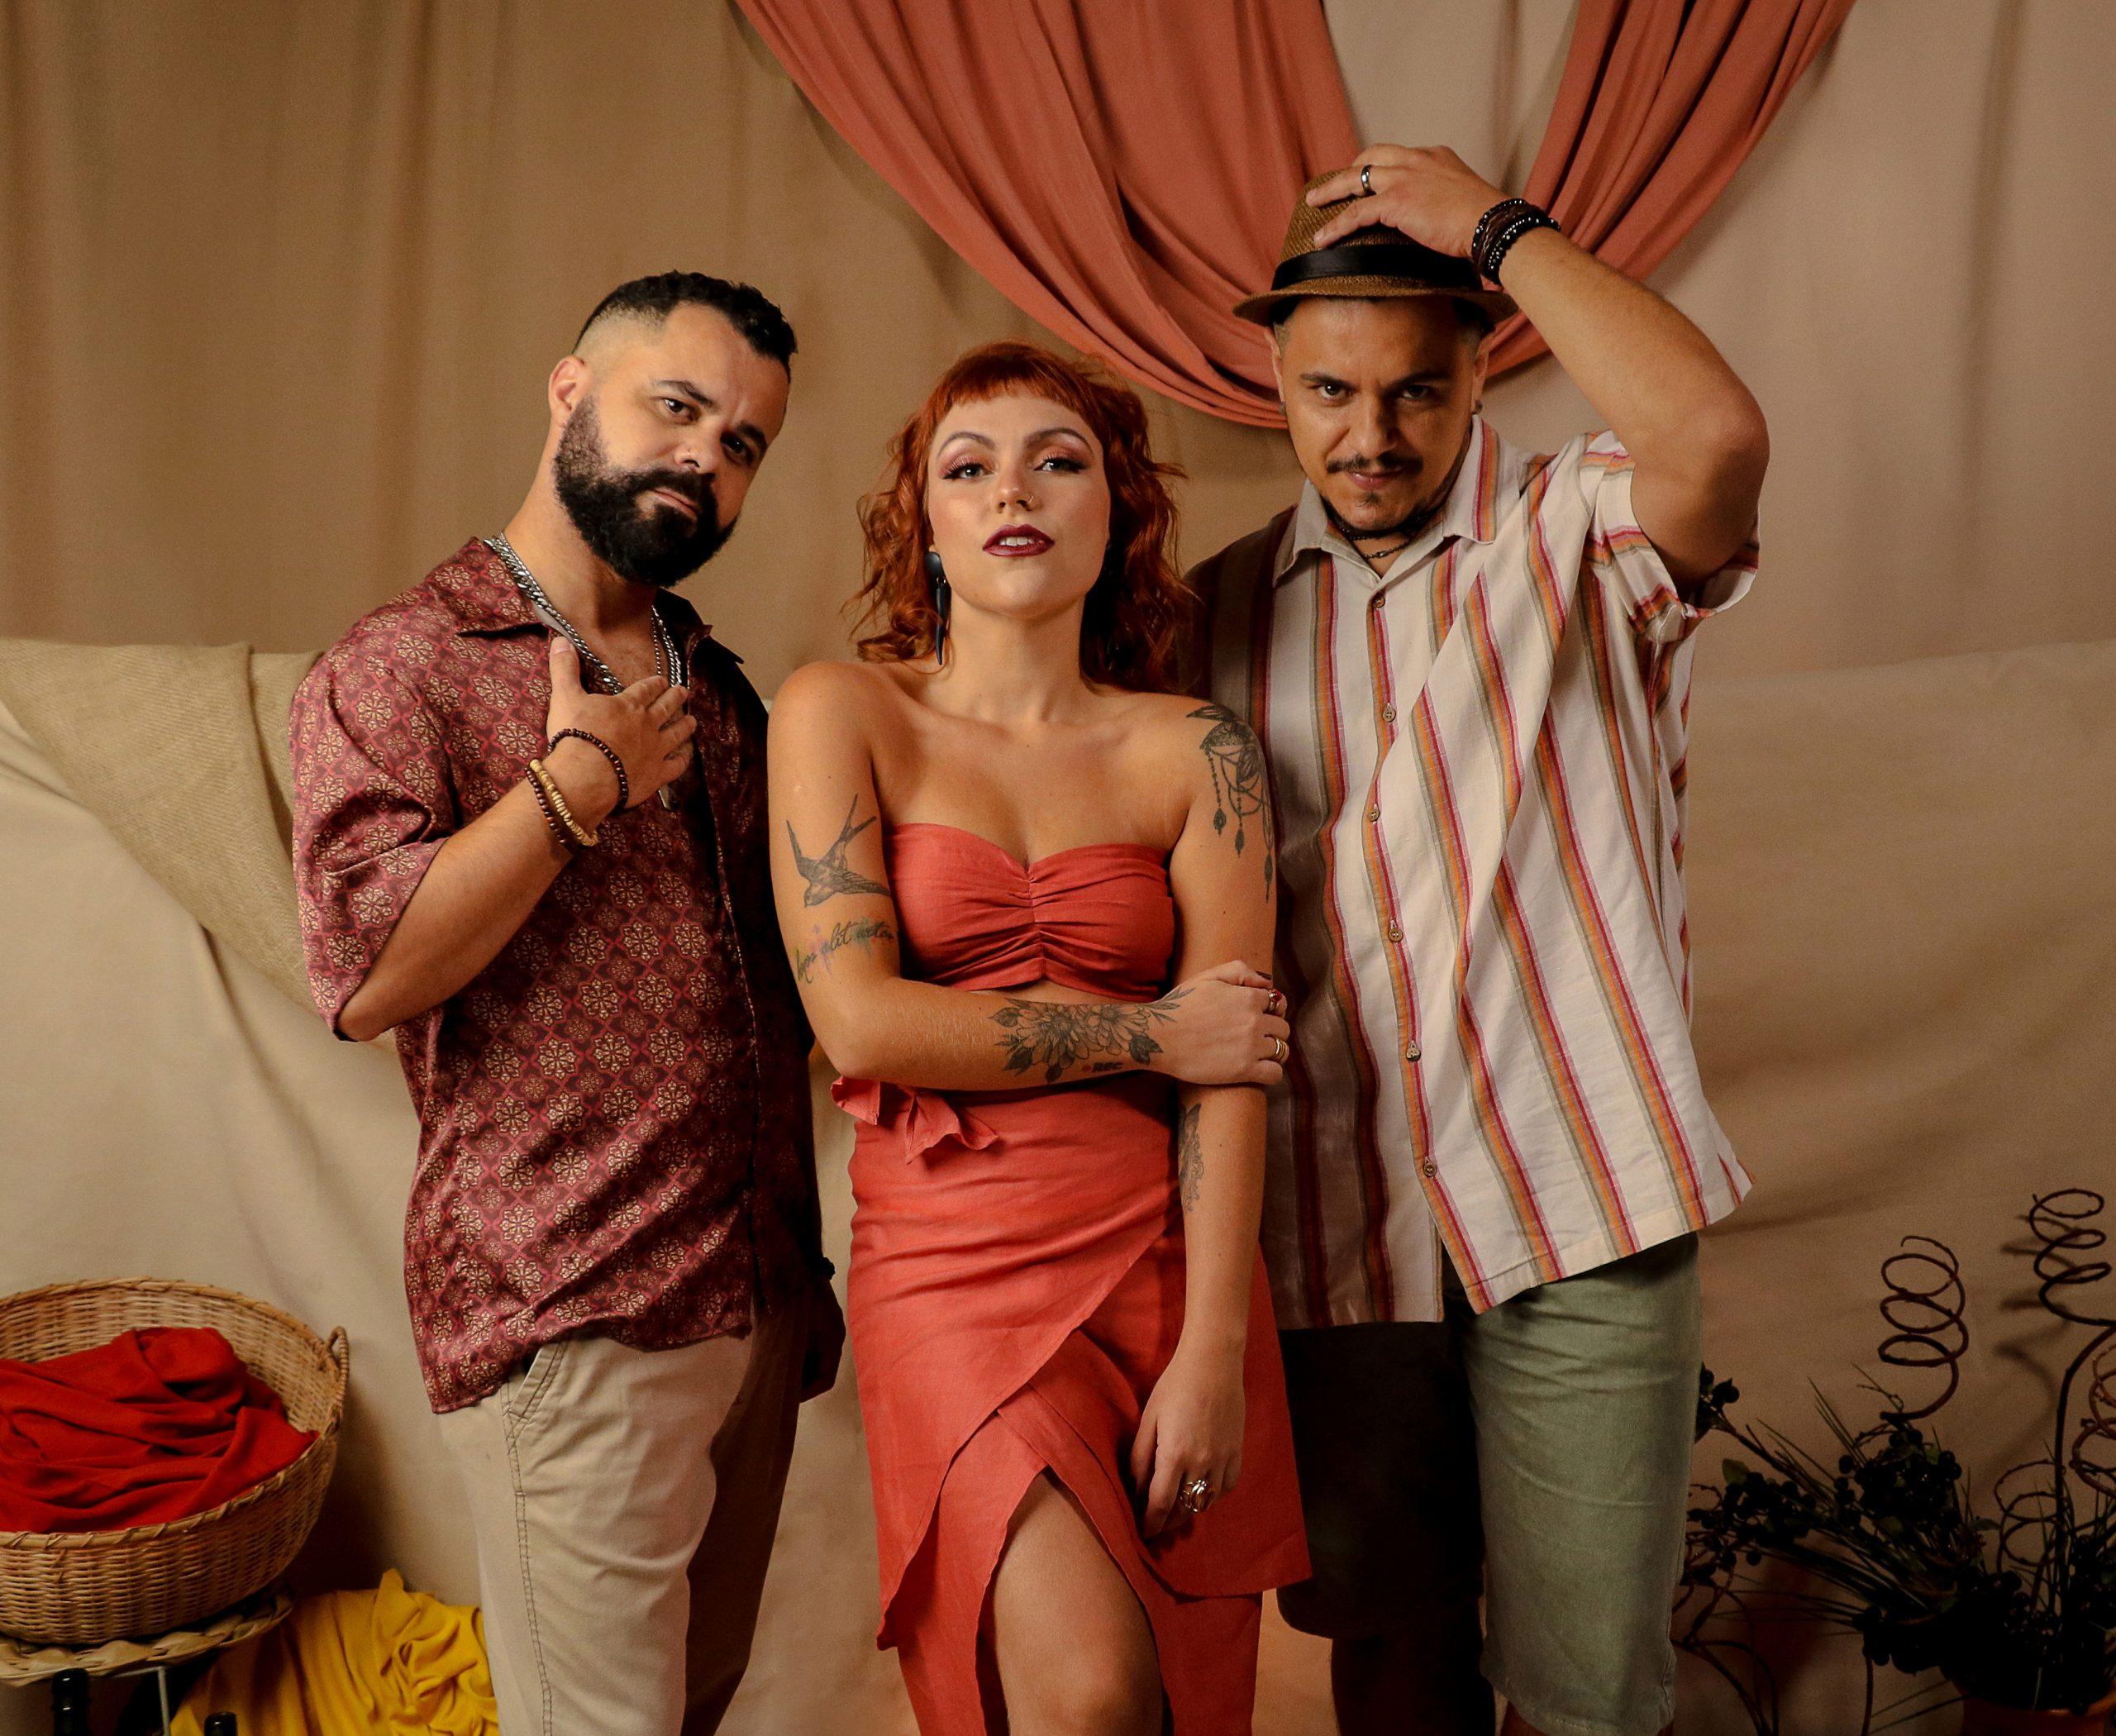 Ladrillo – entrevista exclusiva com a banda